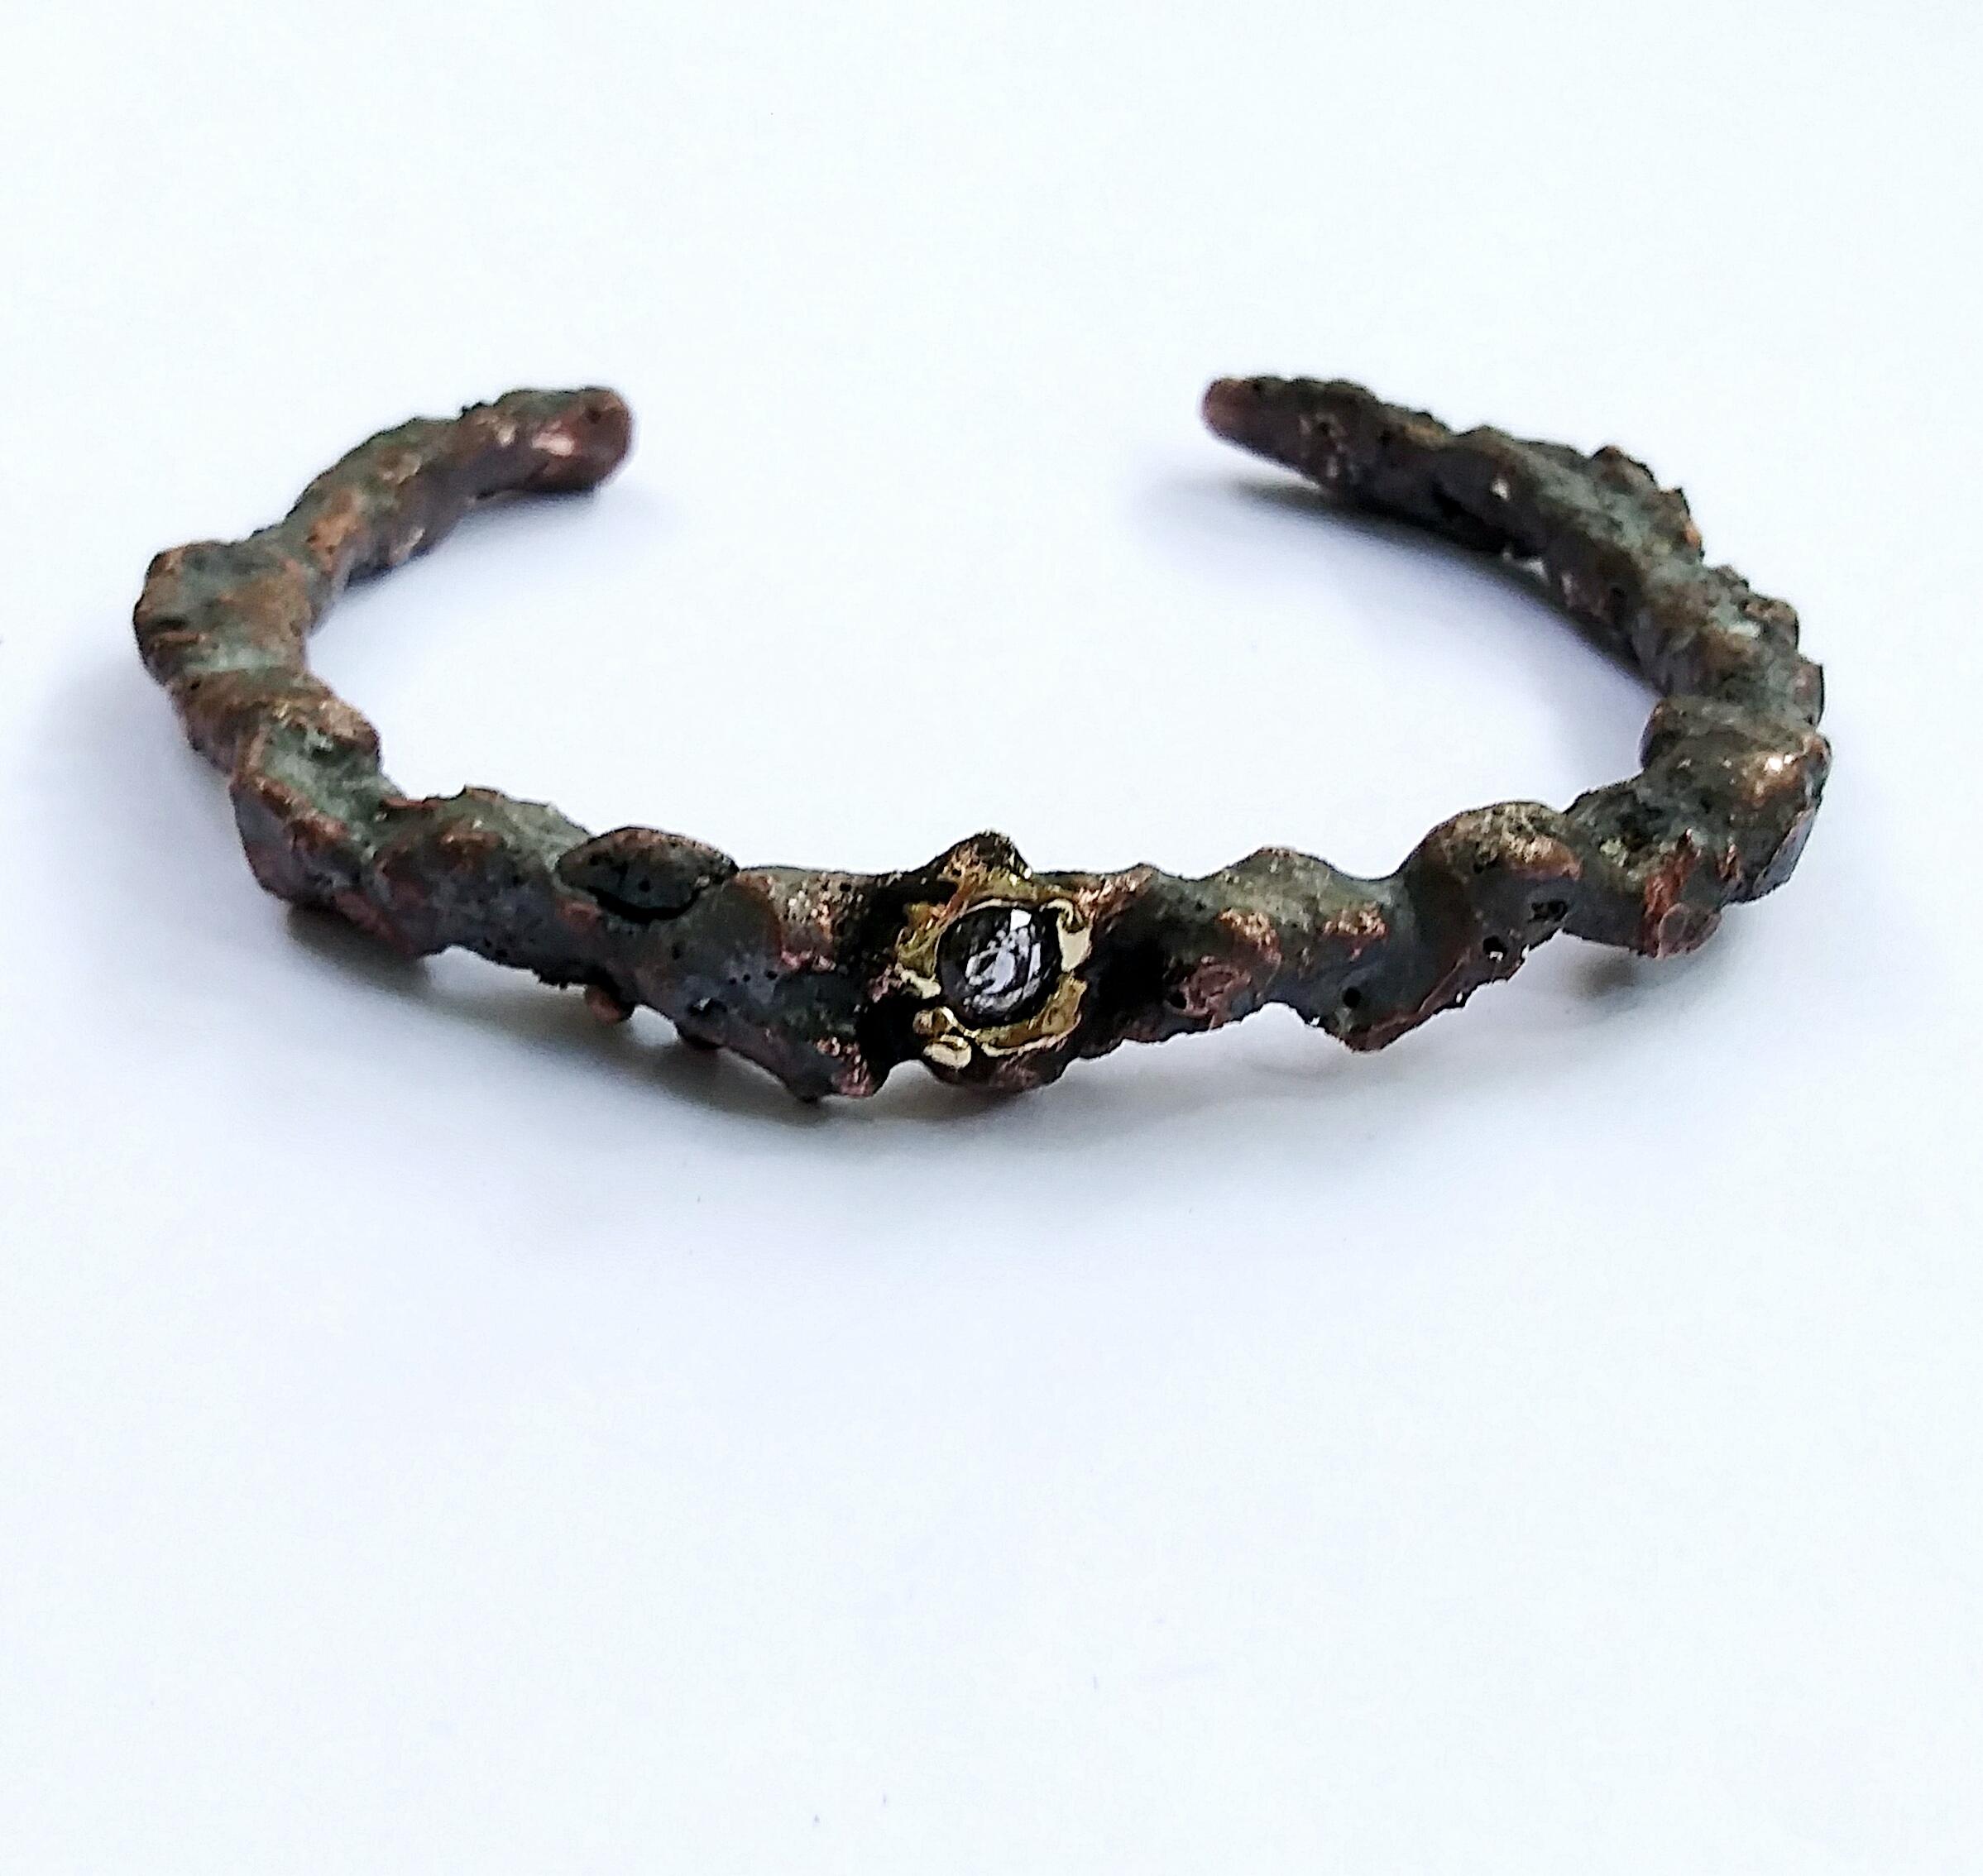 Wrought Iron Cuff Bracelet